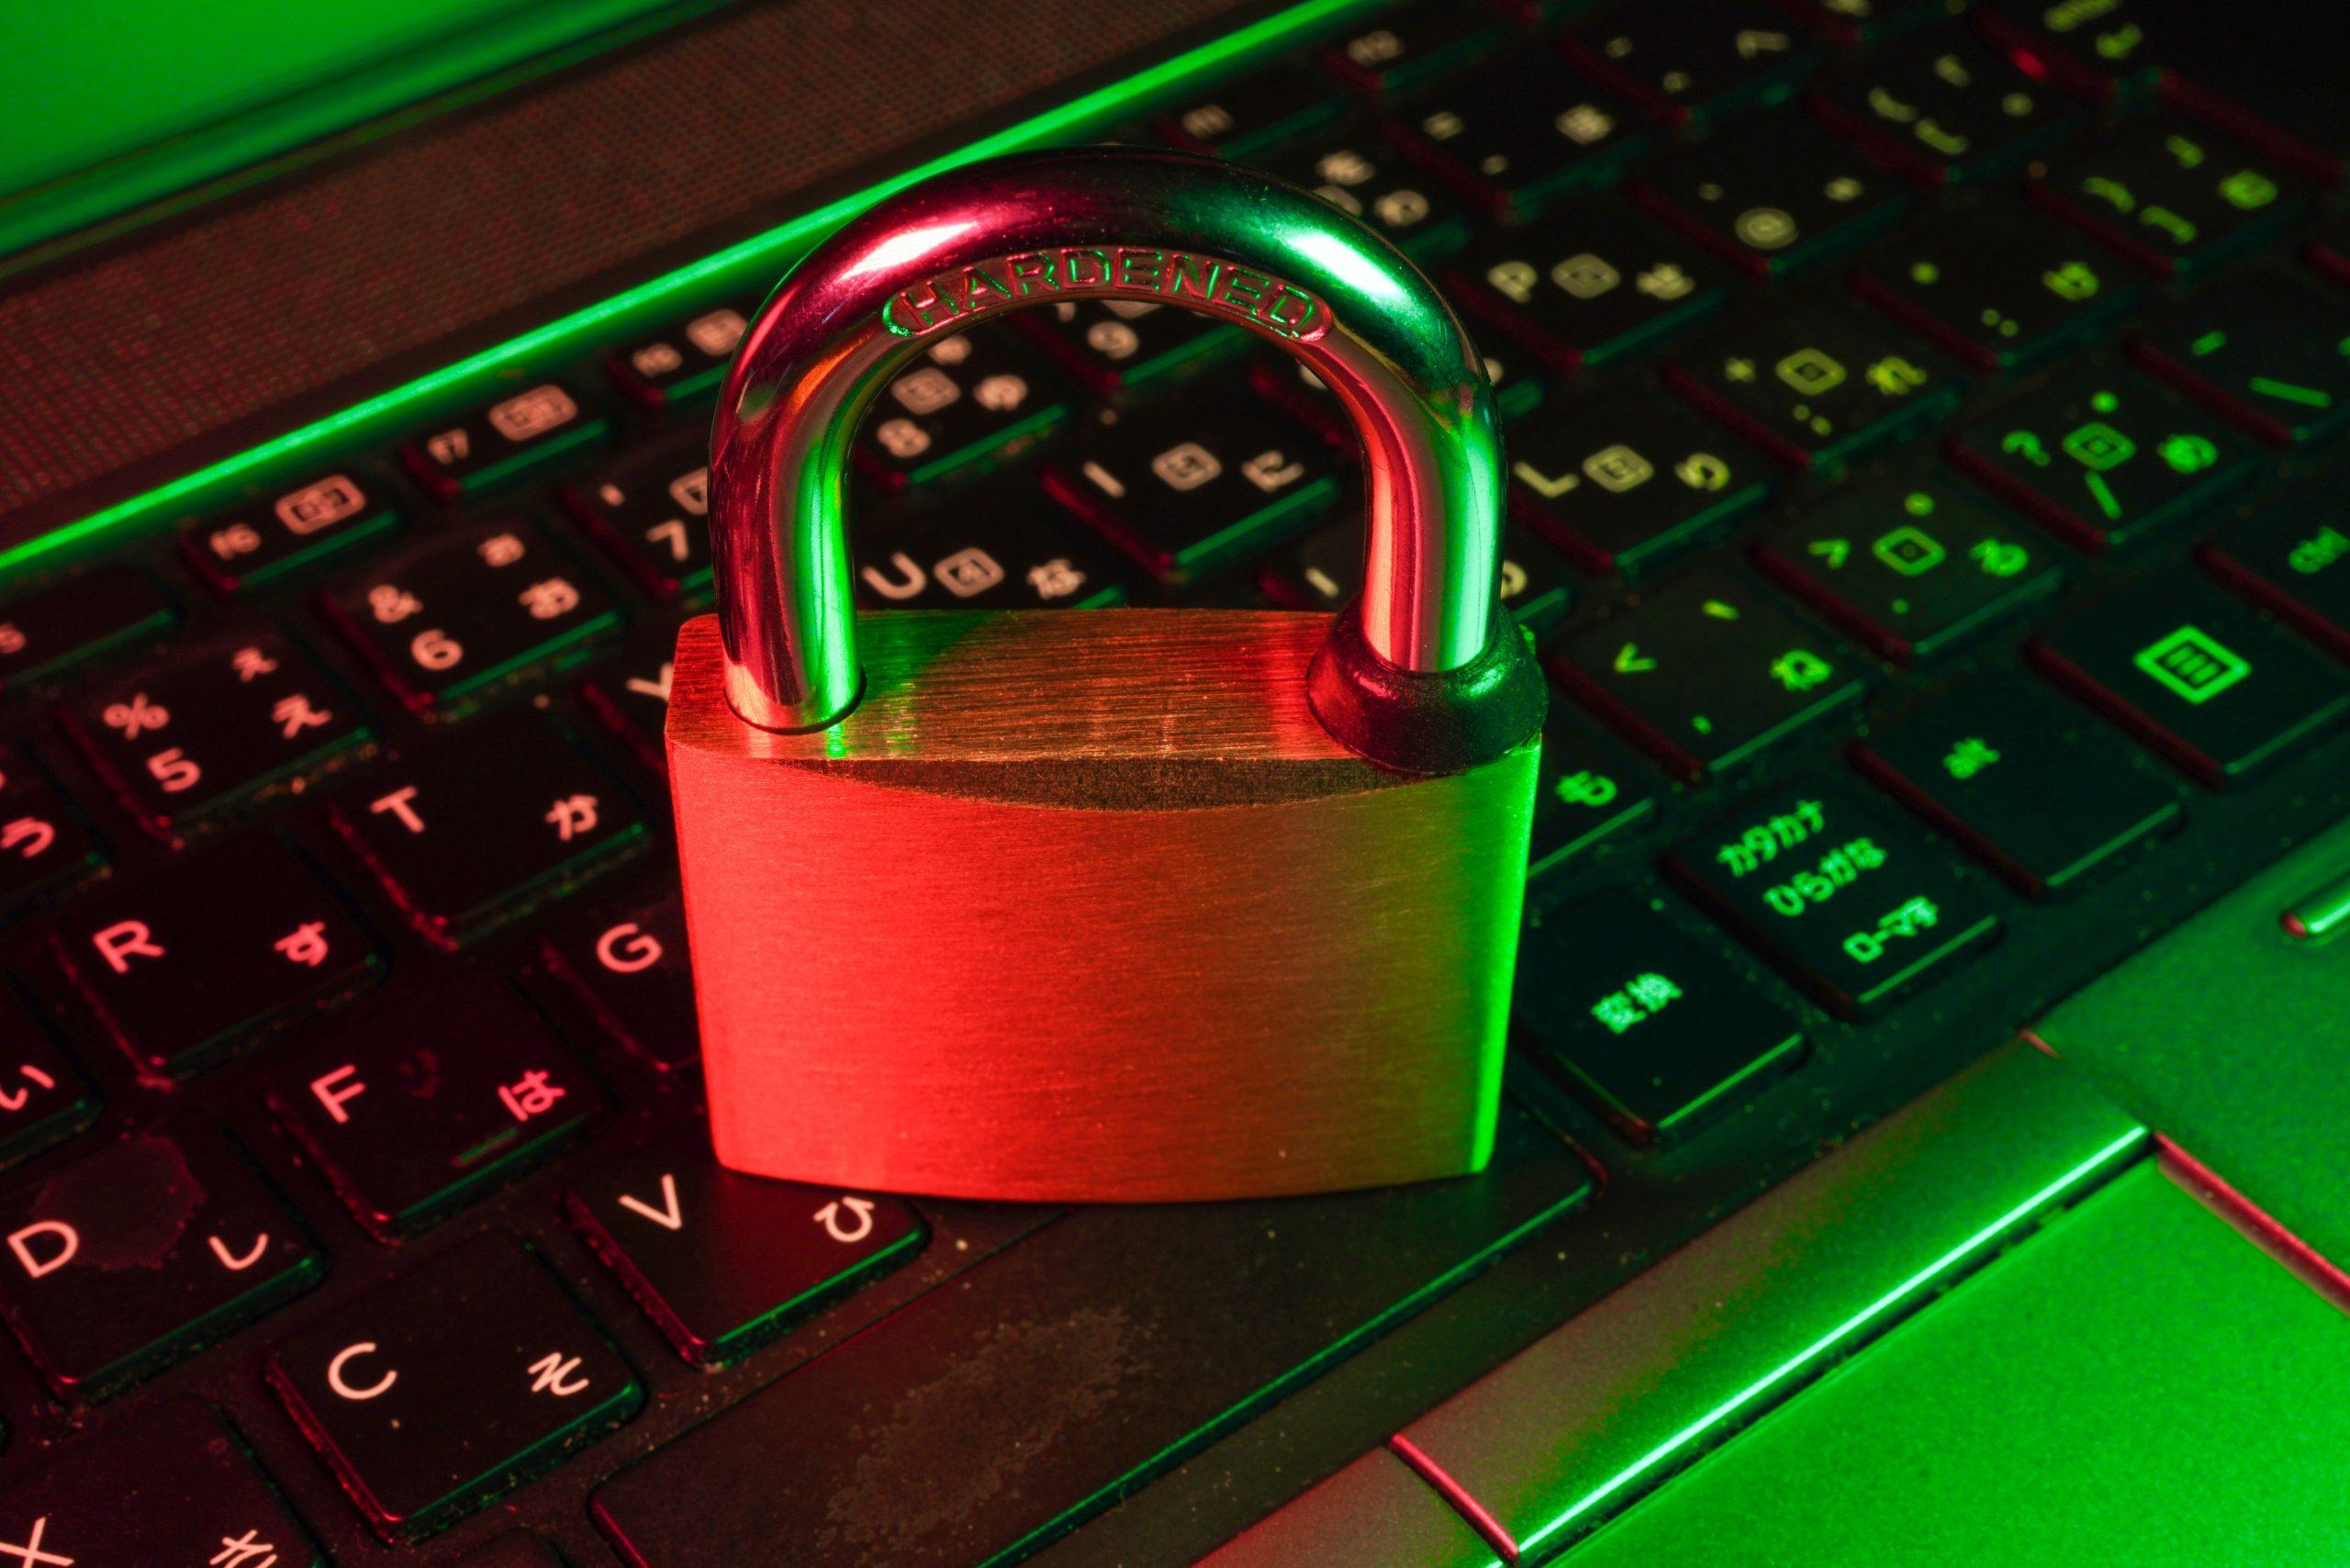 CybersecurityLockKeyboard